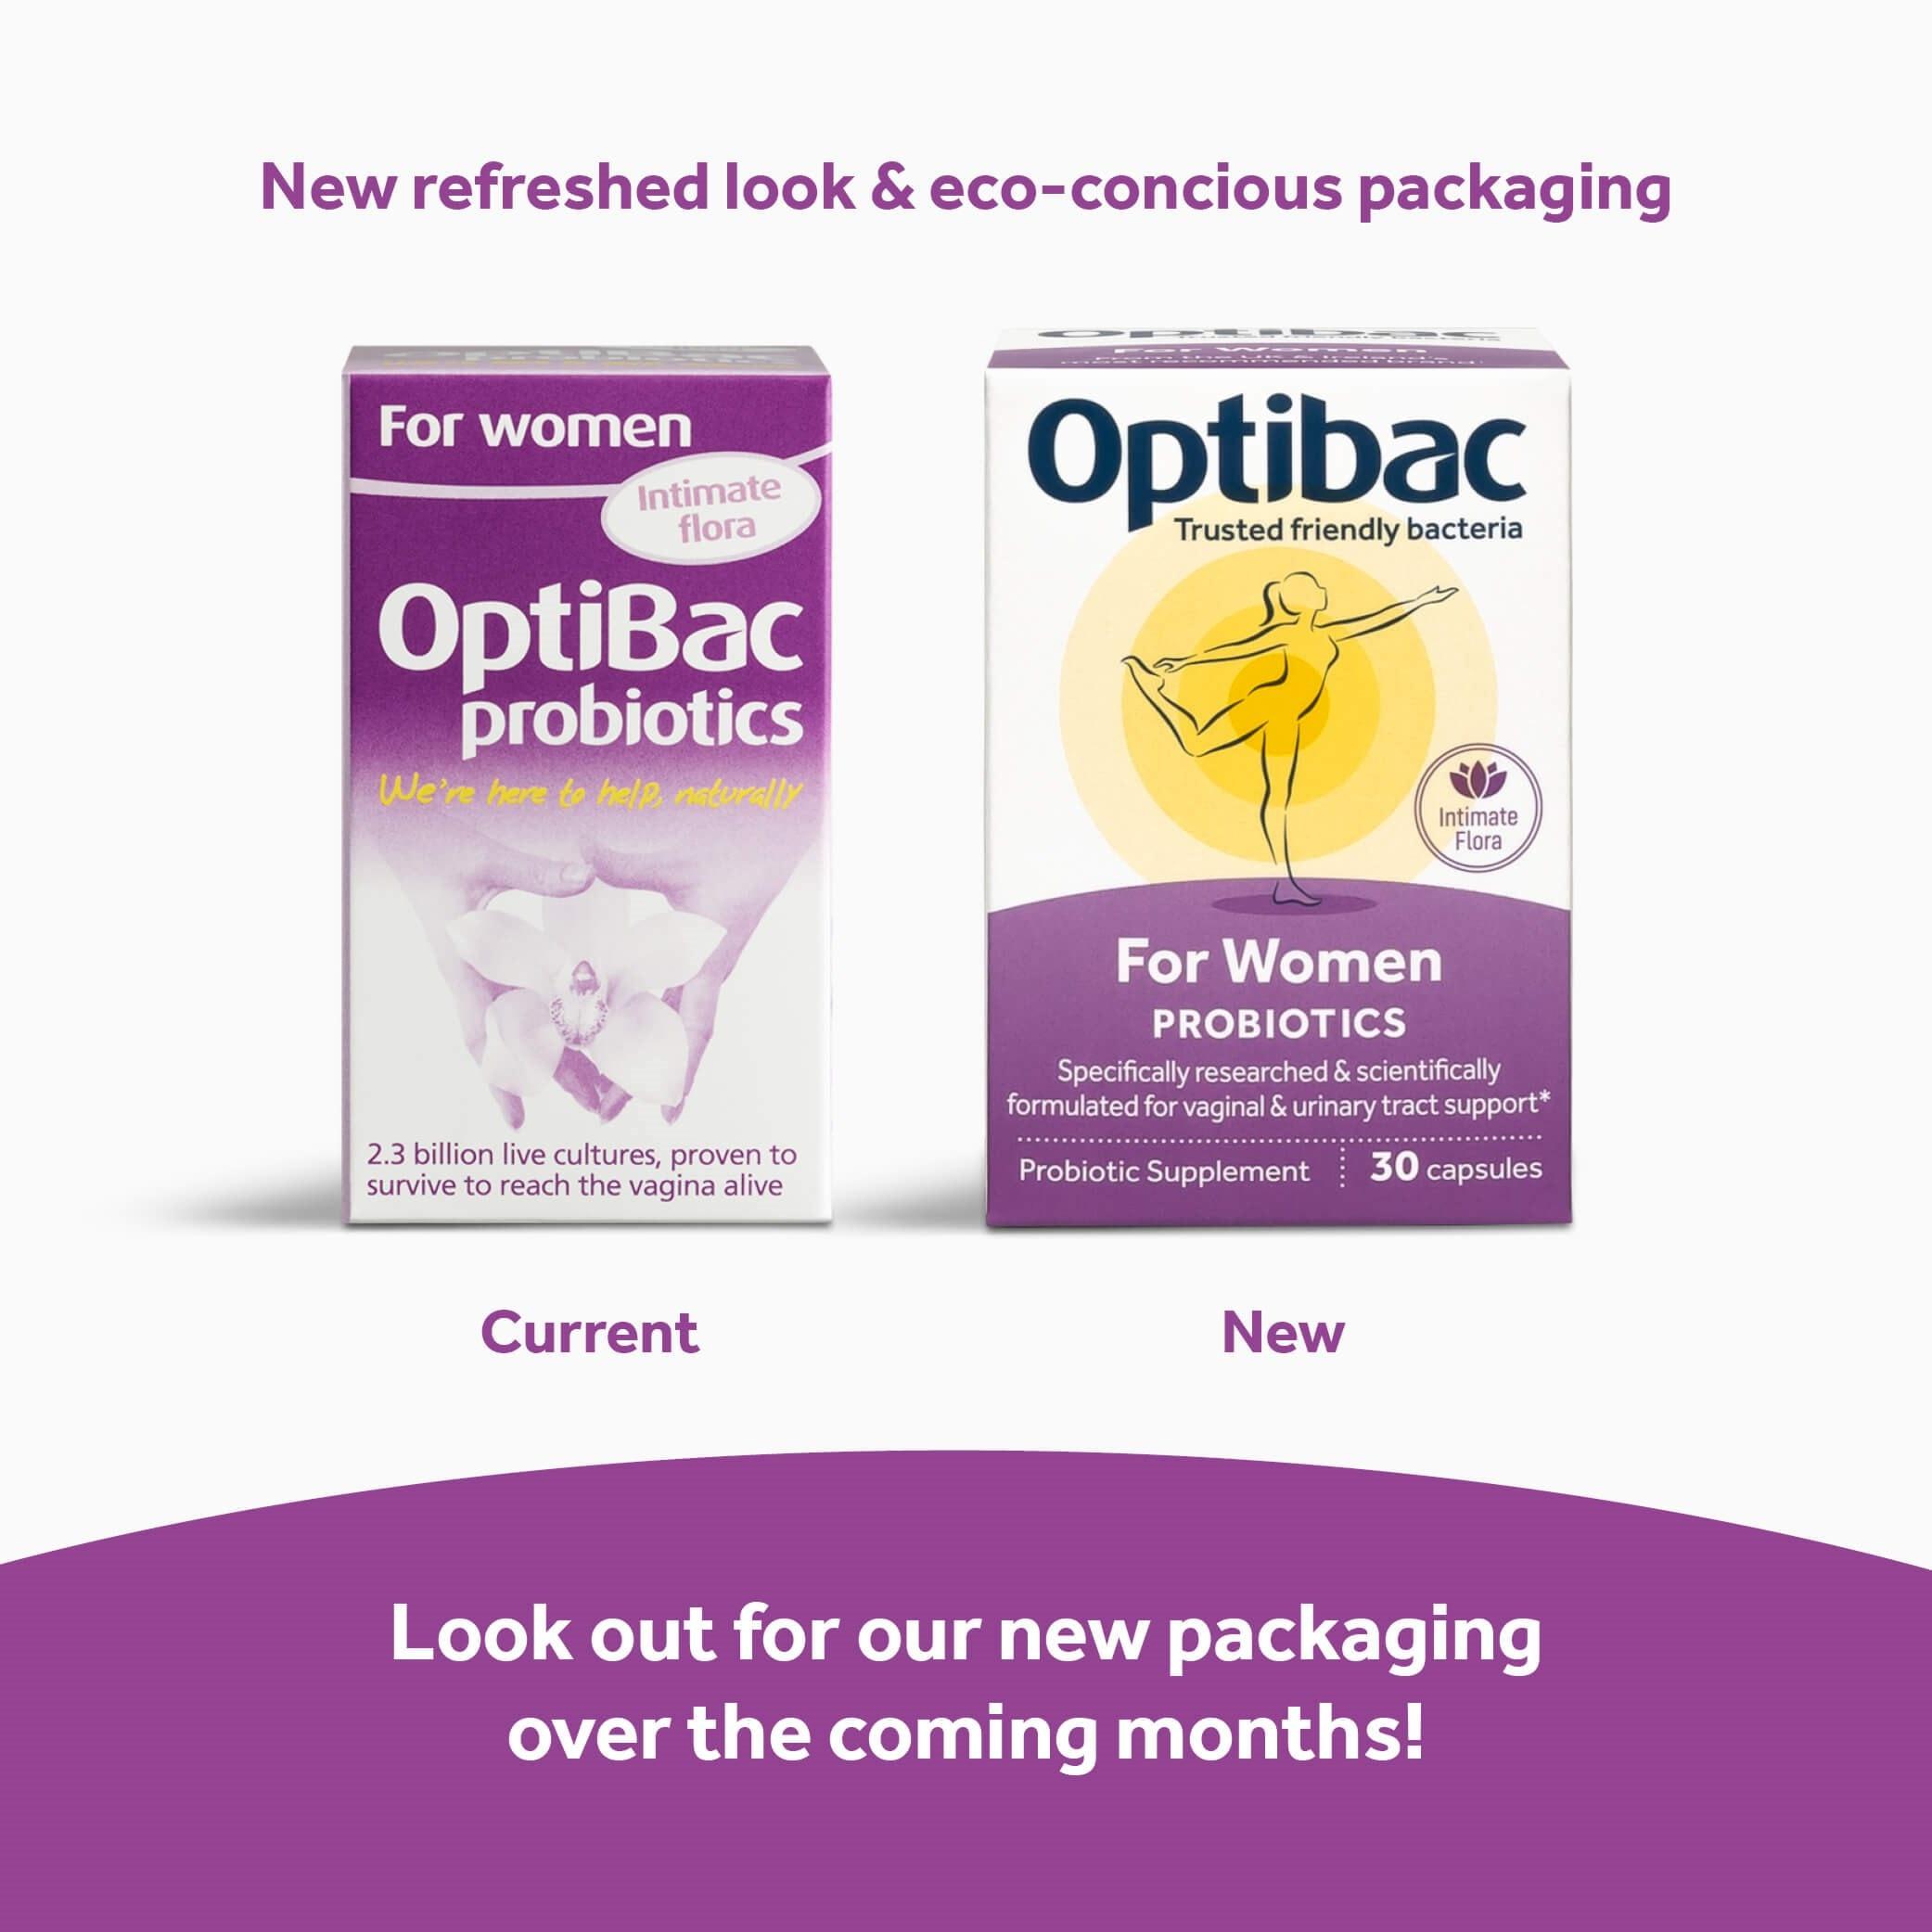 Optibac Probiotics For Women proven to reach vagina